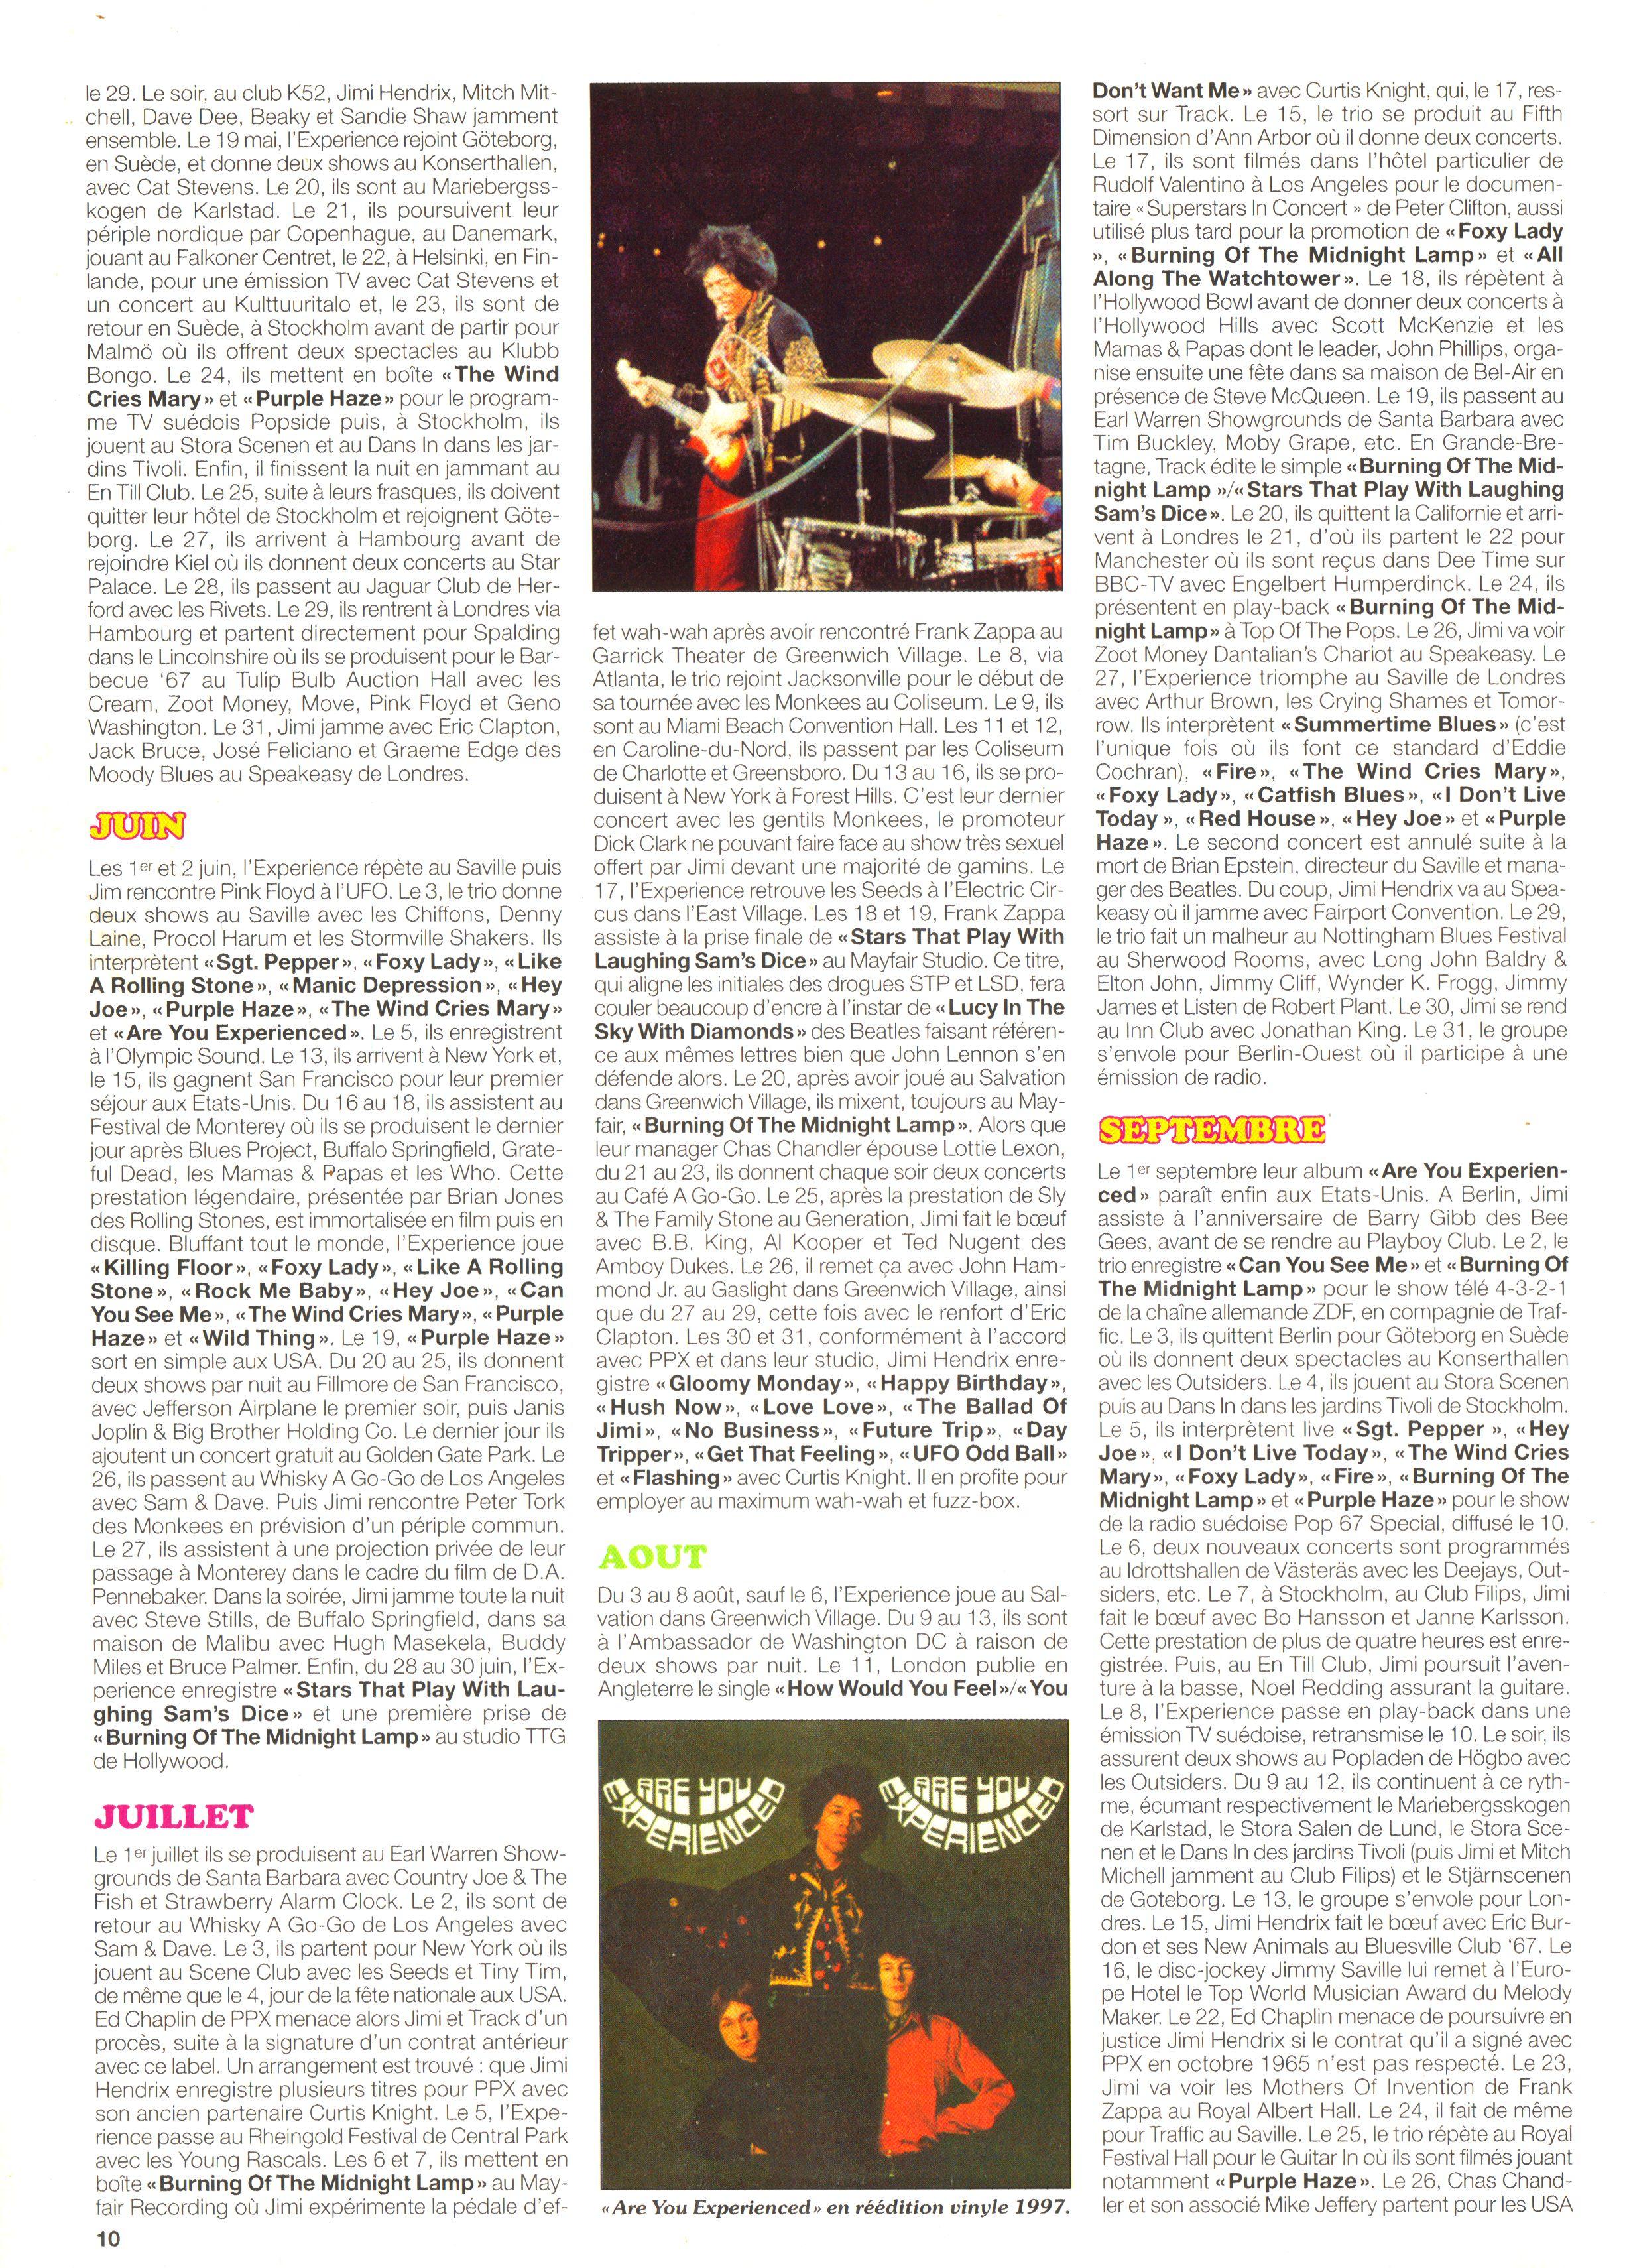 Magazines Français 1989 - 2014 JukeBoxJanvier2005Page10